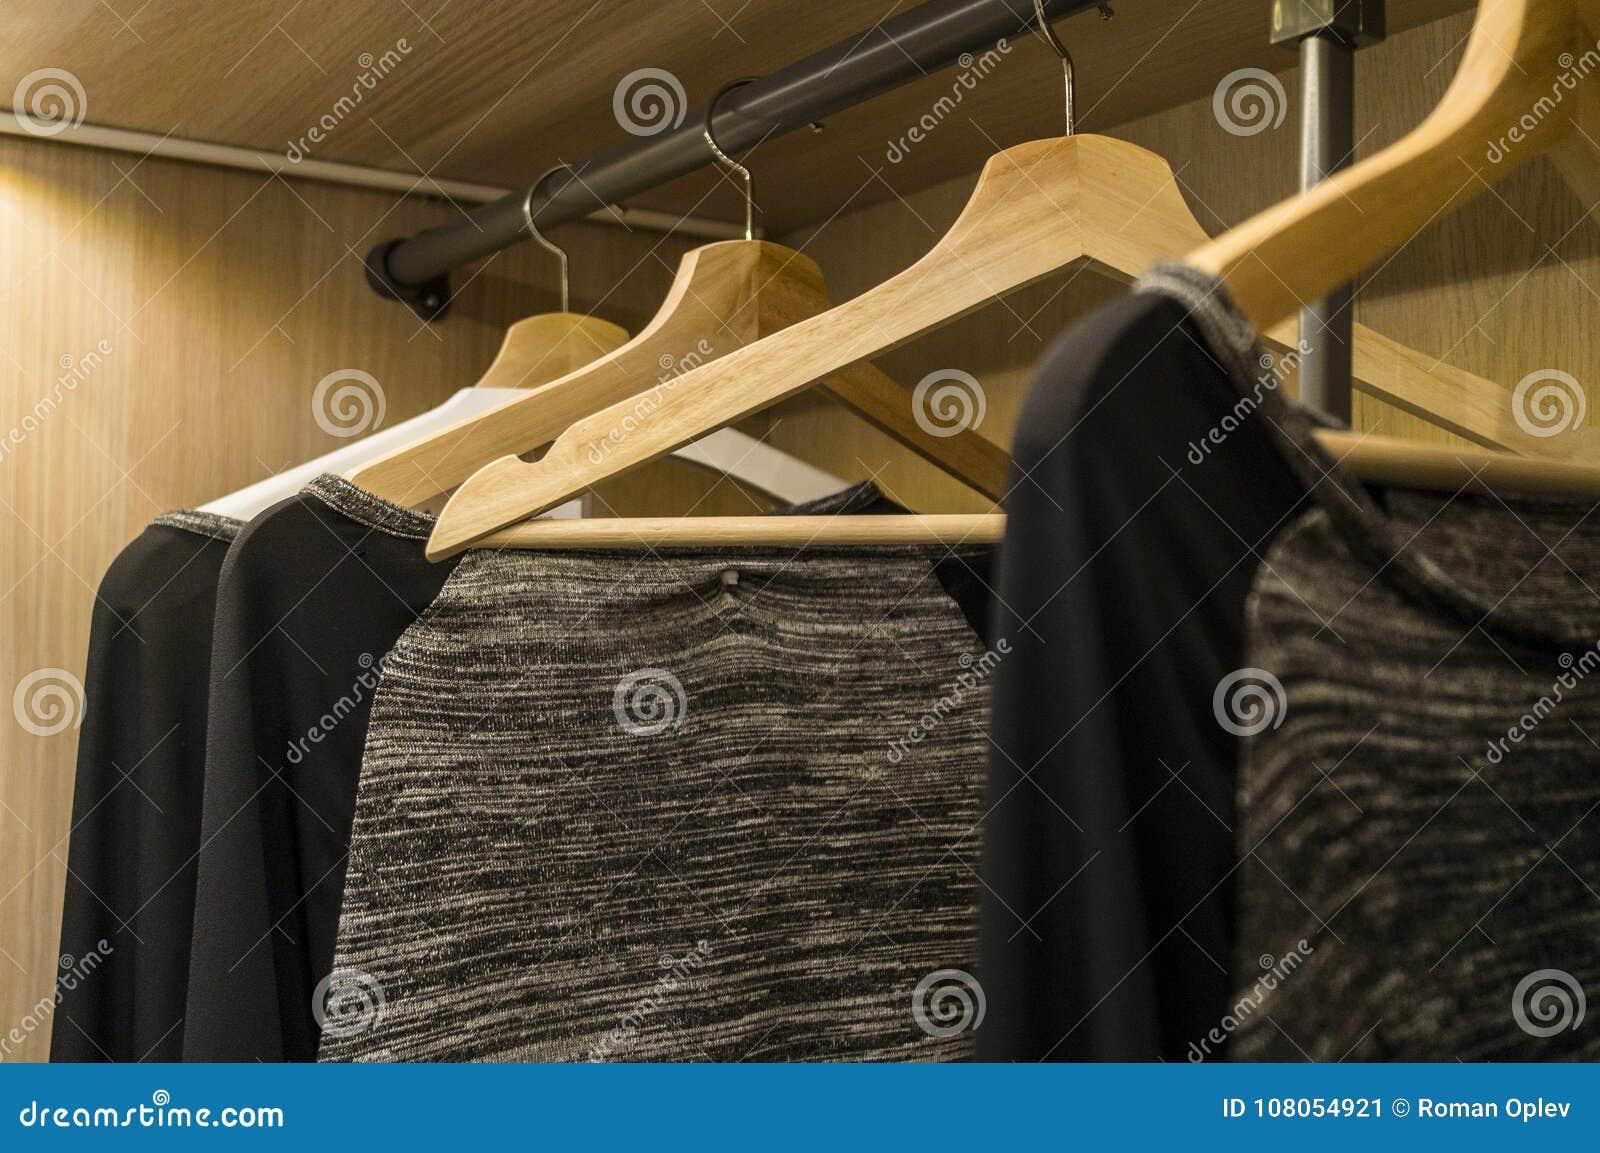 d21812c7f948 Διάφορα Symmetrically κρεμασμένα μαύρα θηλυκά πουκάμισα Στοκ Εικόνα ...